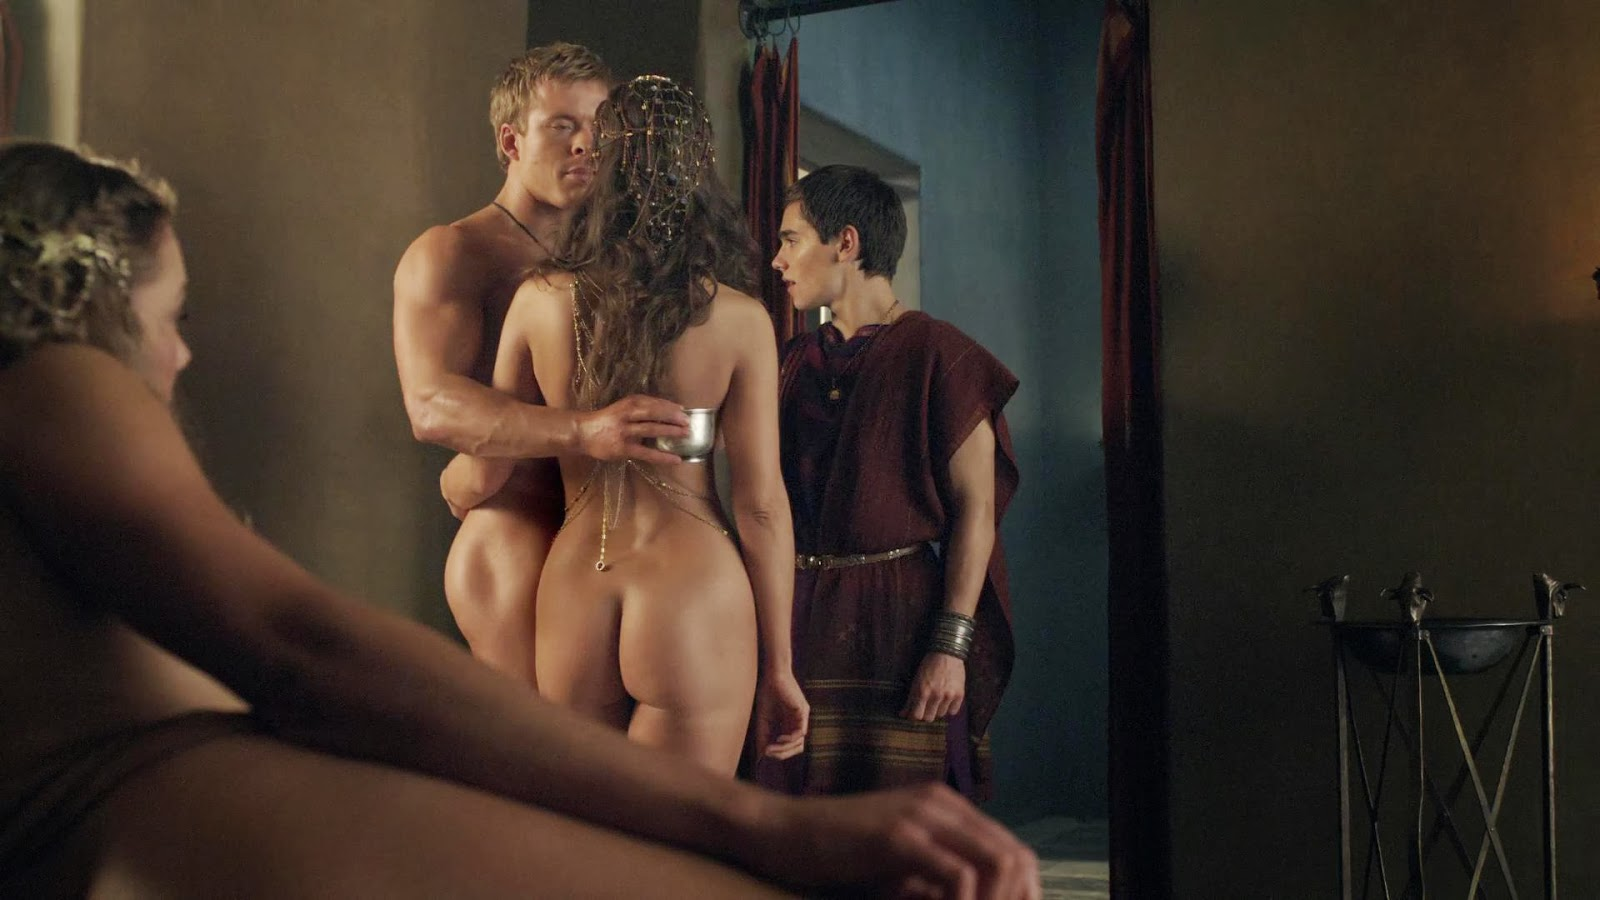 Spartacus Seksi Sevişme Sahneleri 18 Full izle  Film